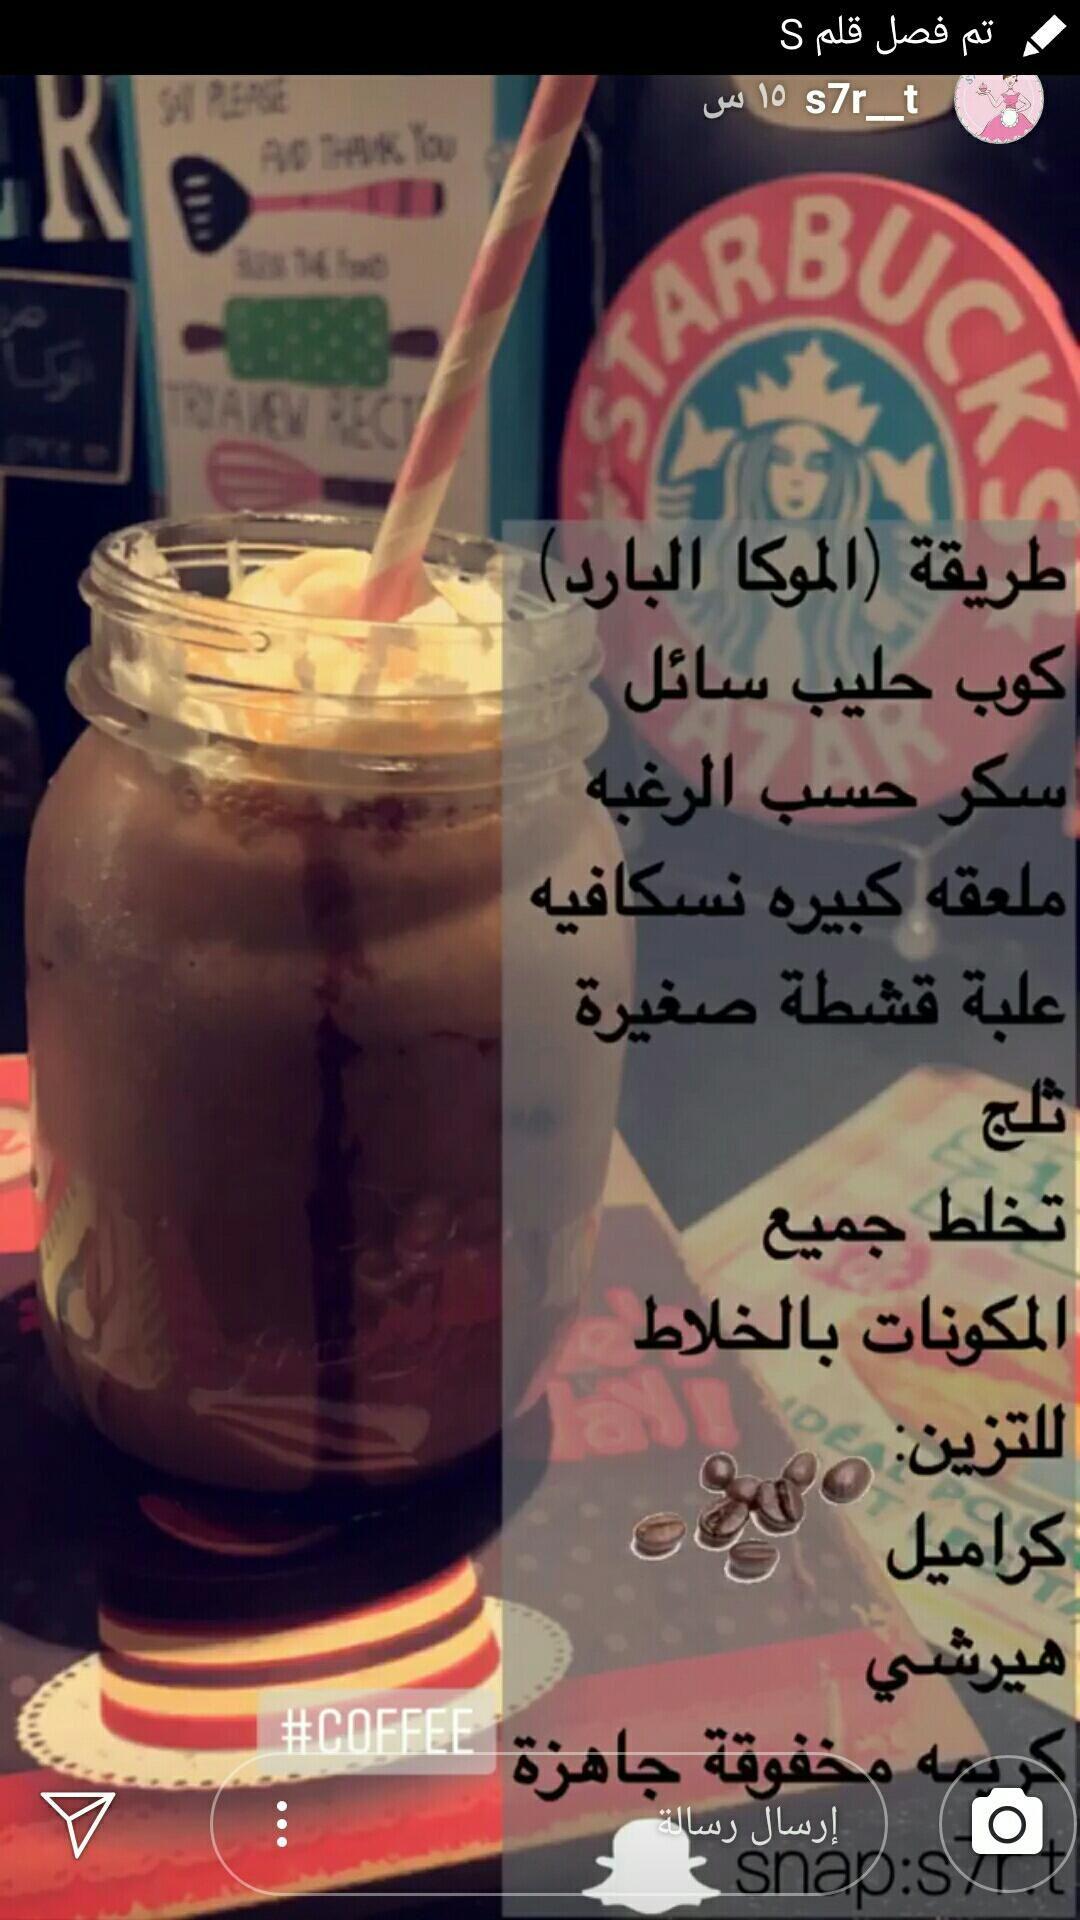 Pin By Sara Hammad On مشروبات Coffee Drink Recipes Summer Drinks Alcohol Yummy Food Dessert